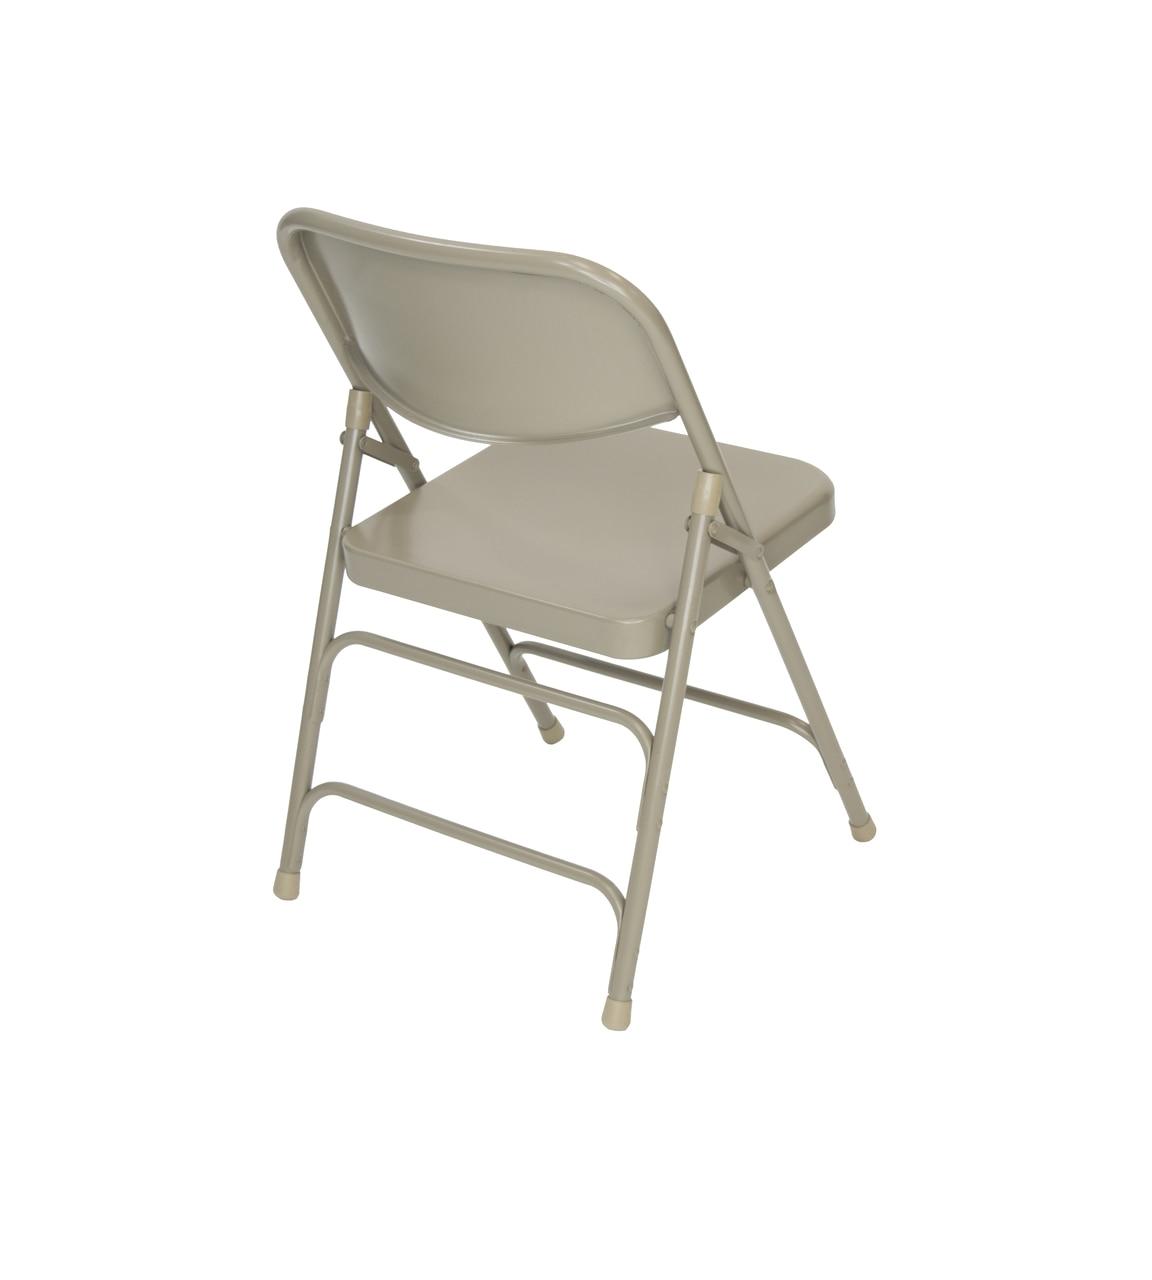 Tri Fold Lawn Chair Classic Series Beige Steel Folding Chair Quad Hinged Triple